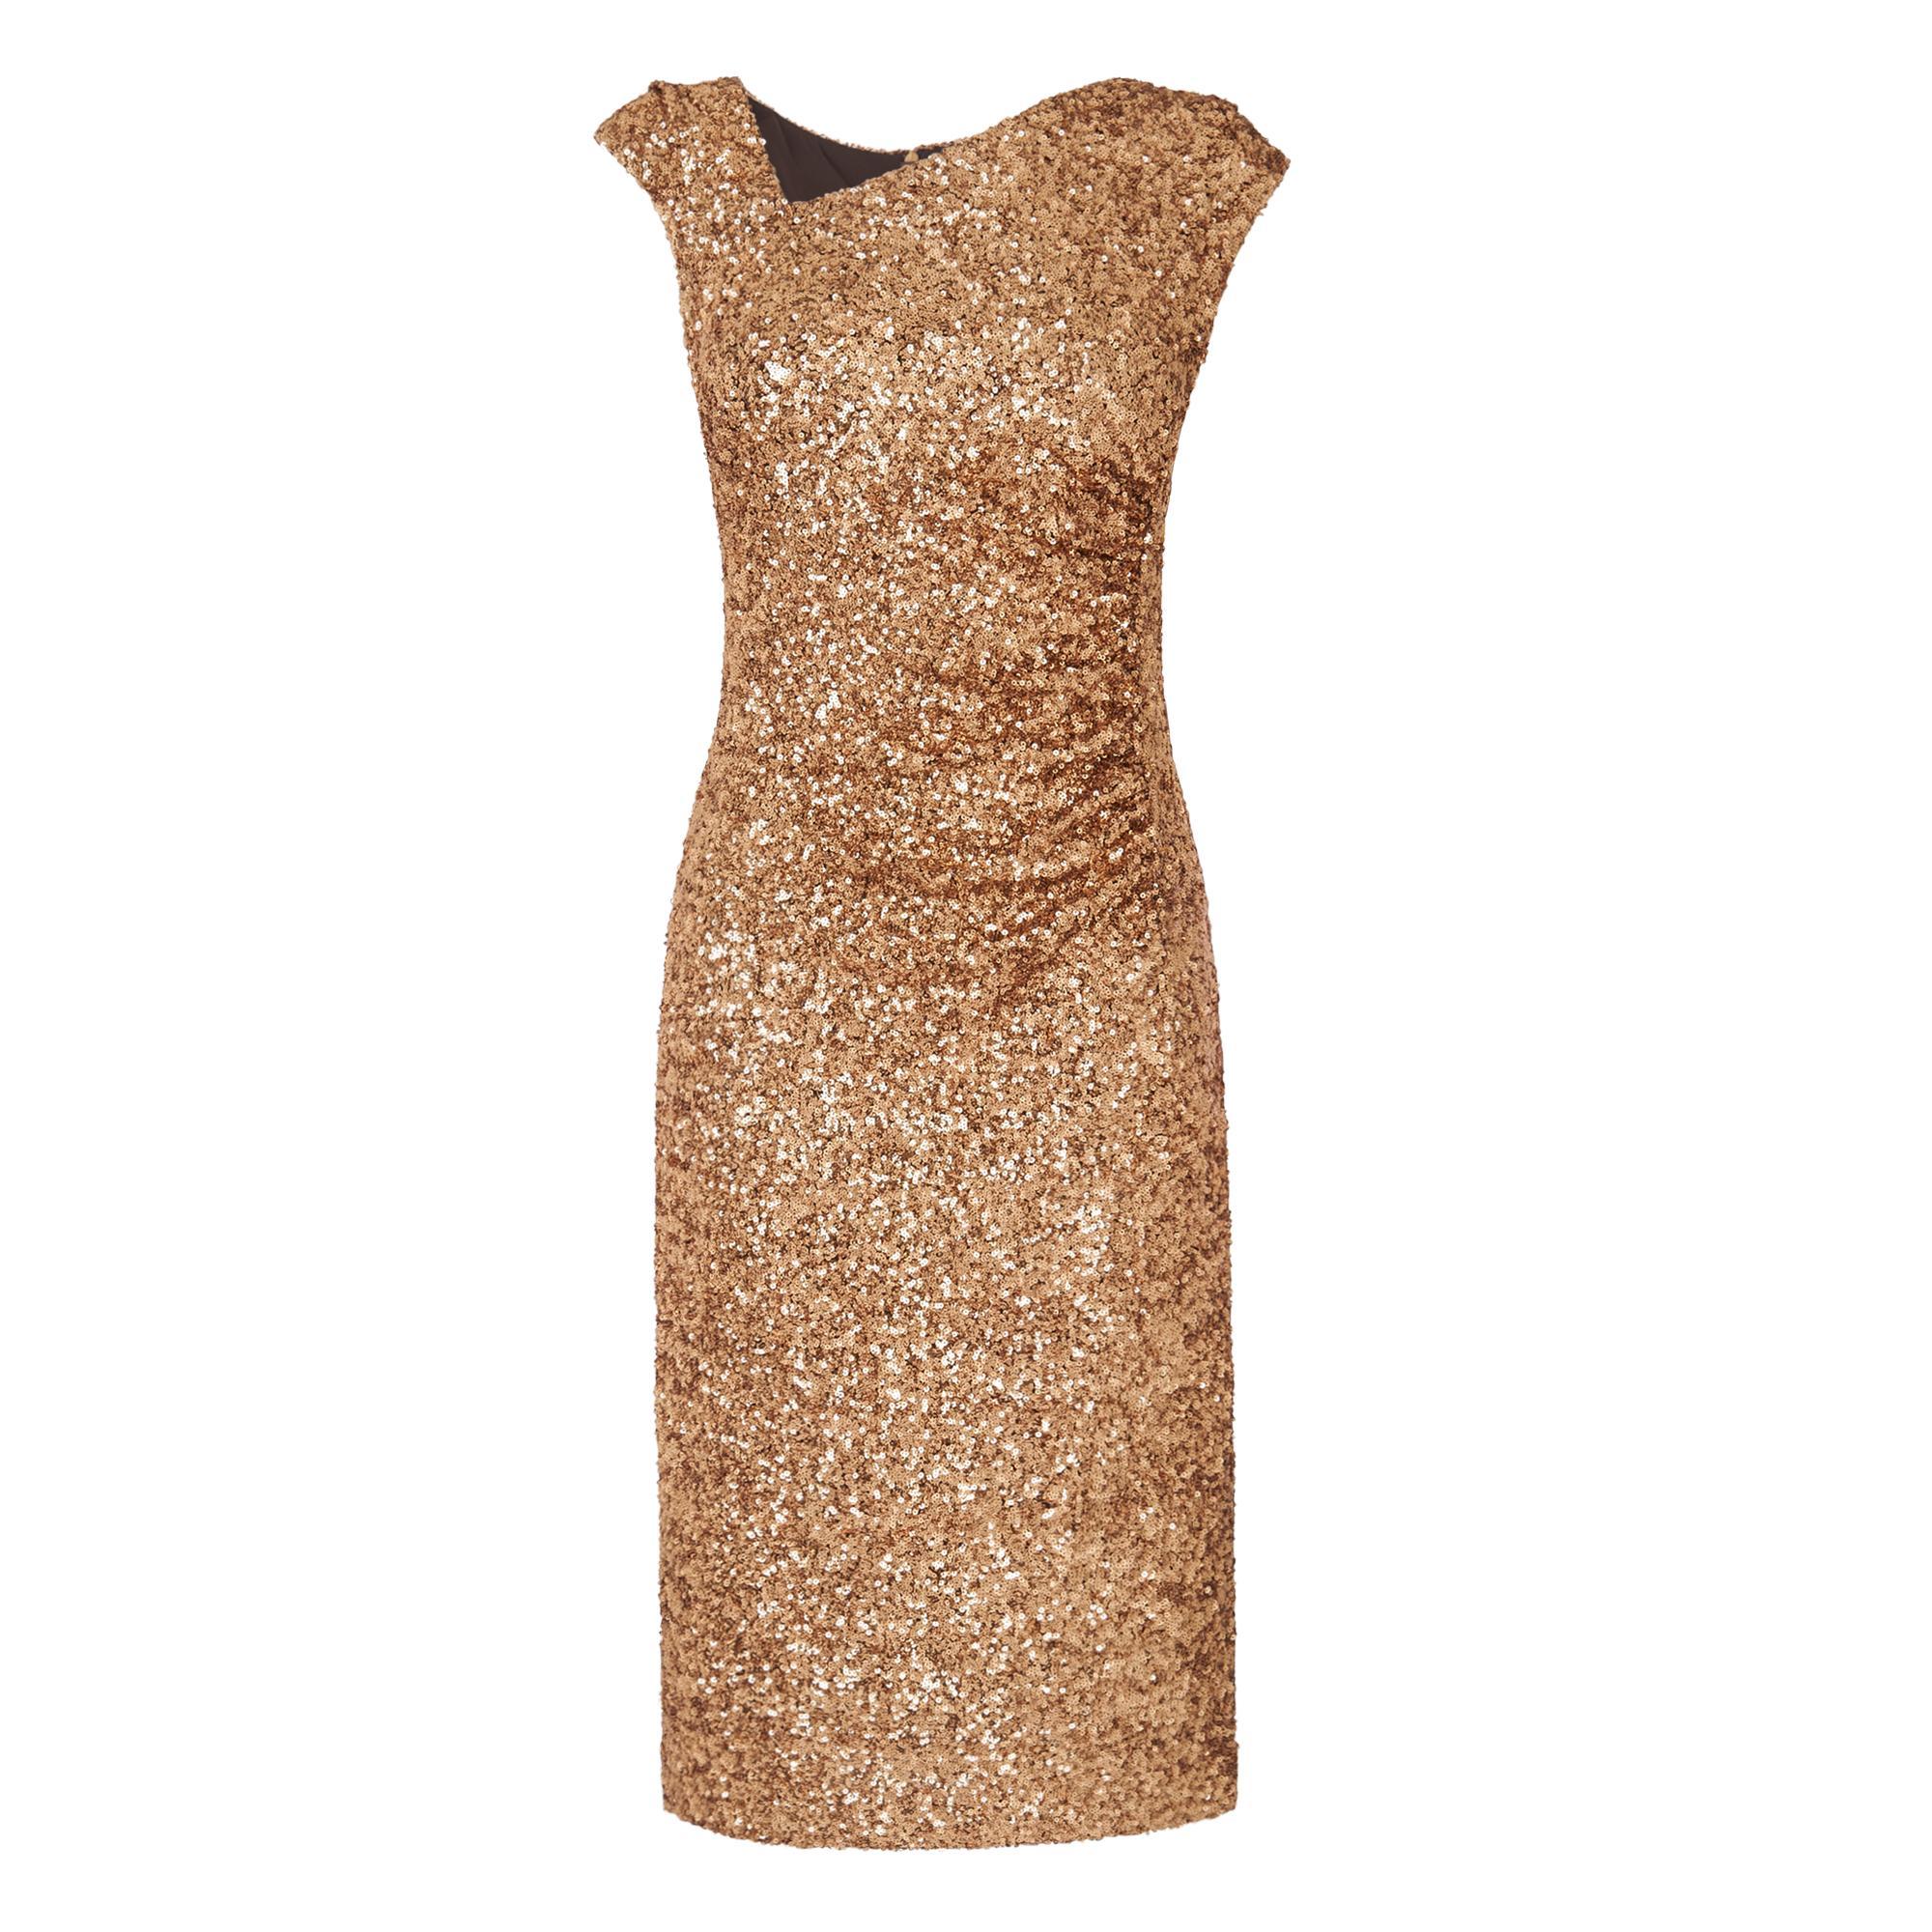 Jazz Gold Sequin Dress